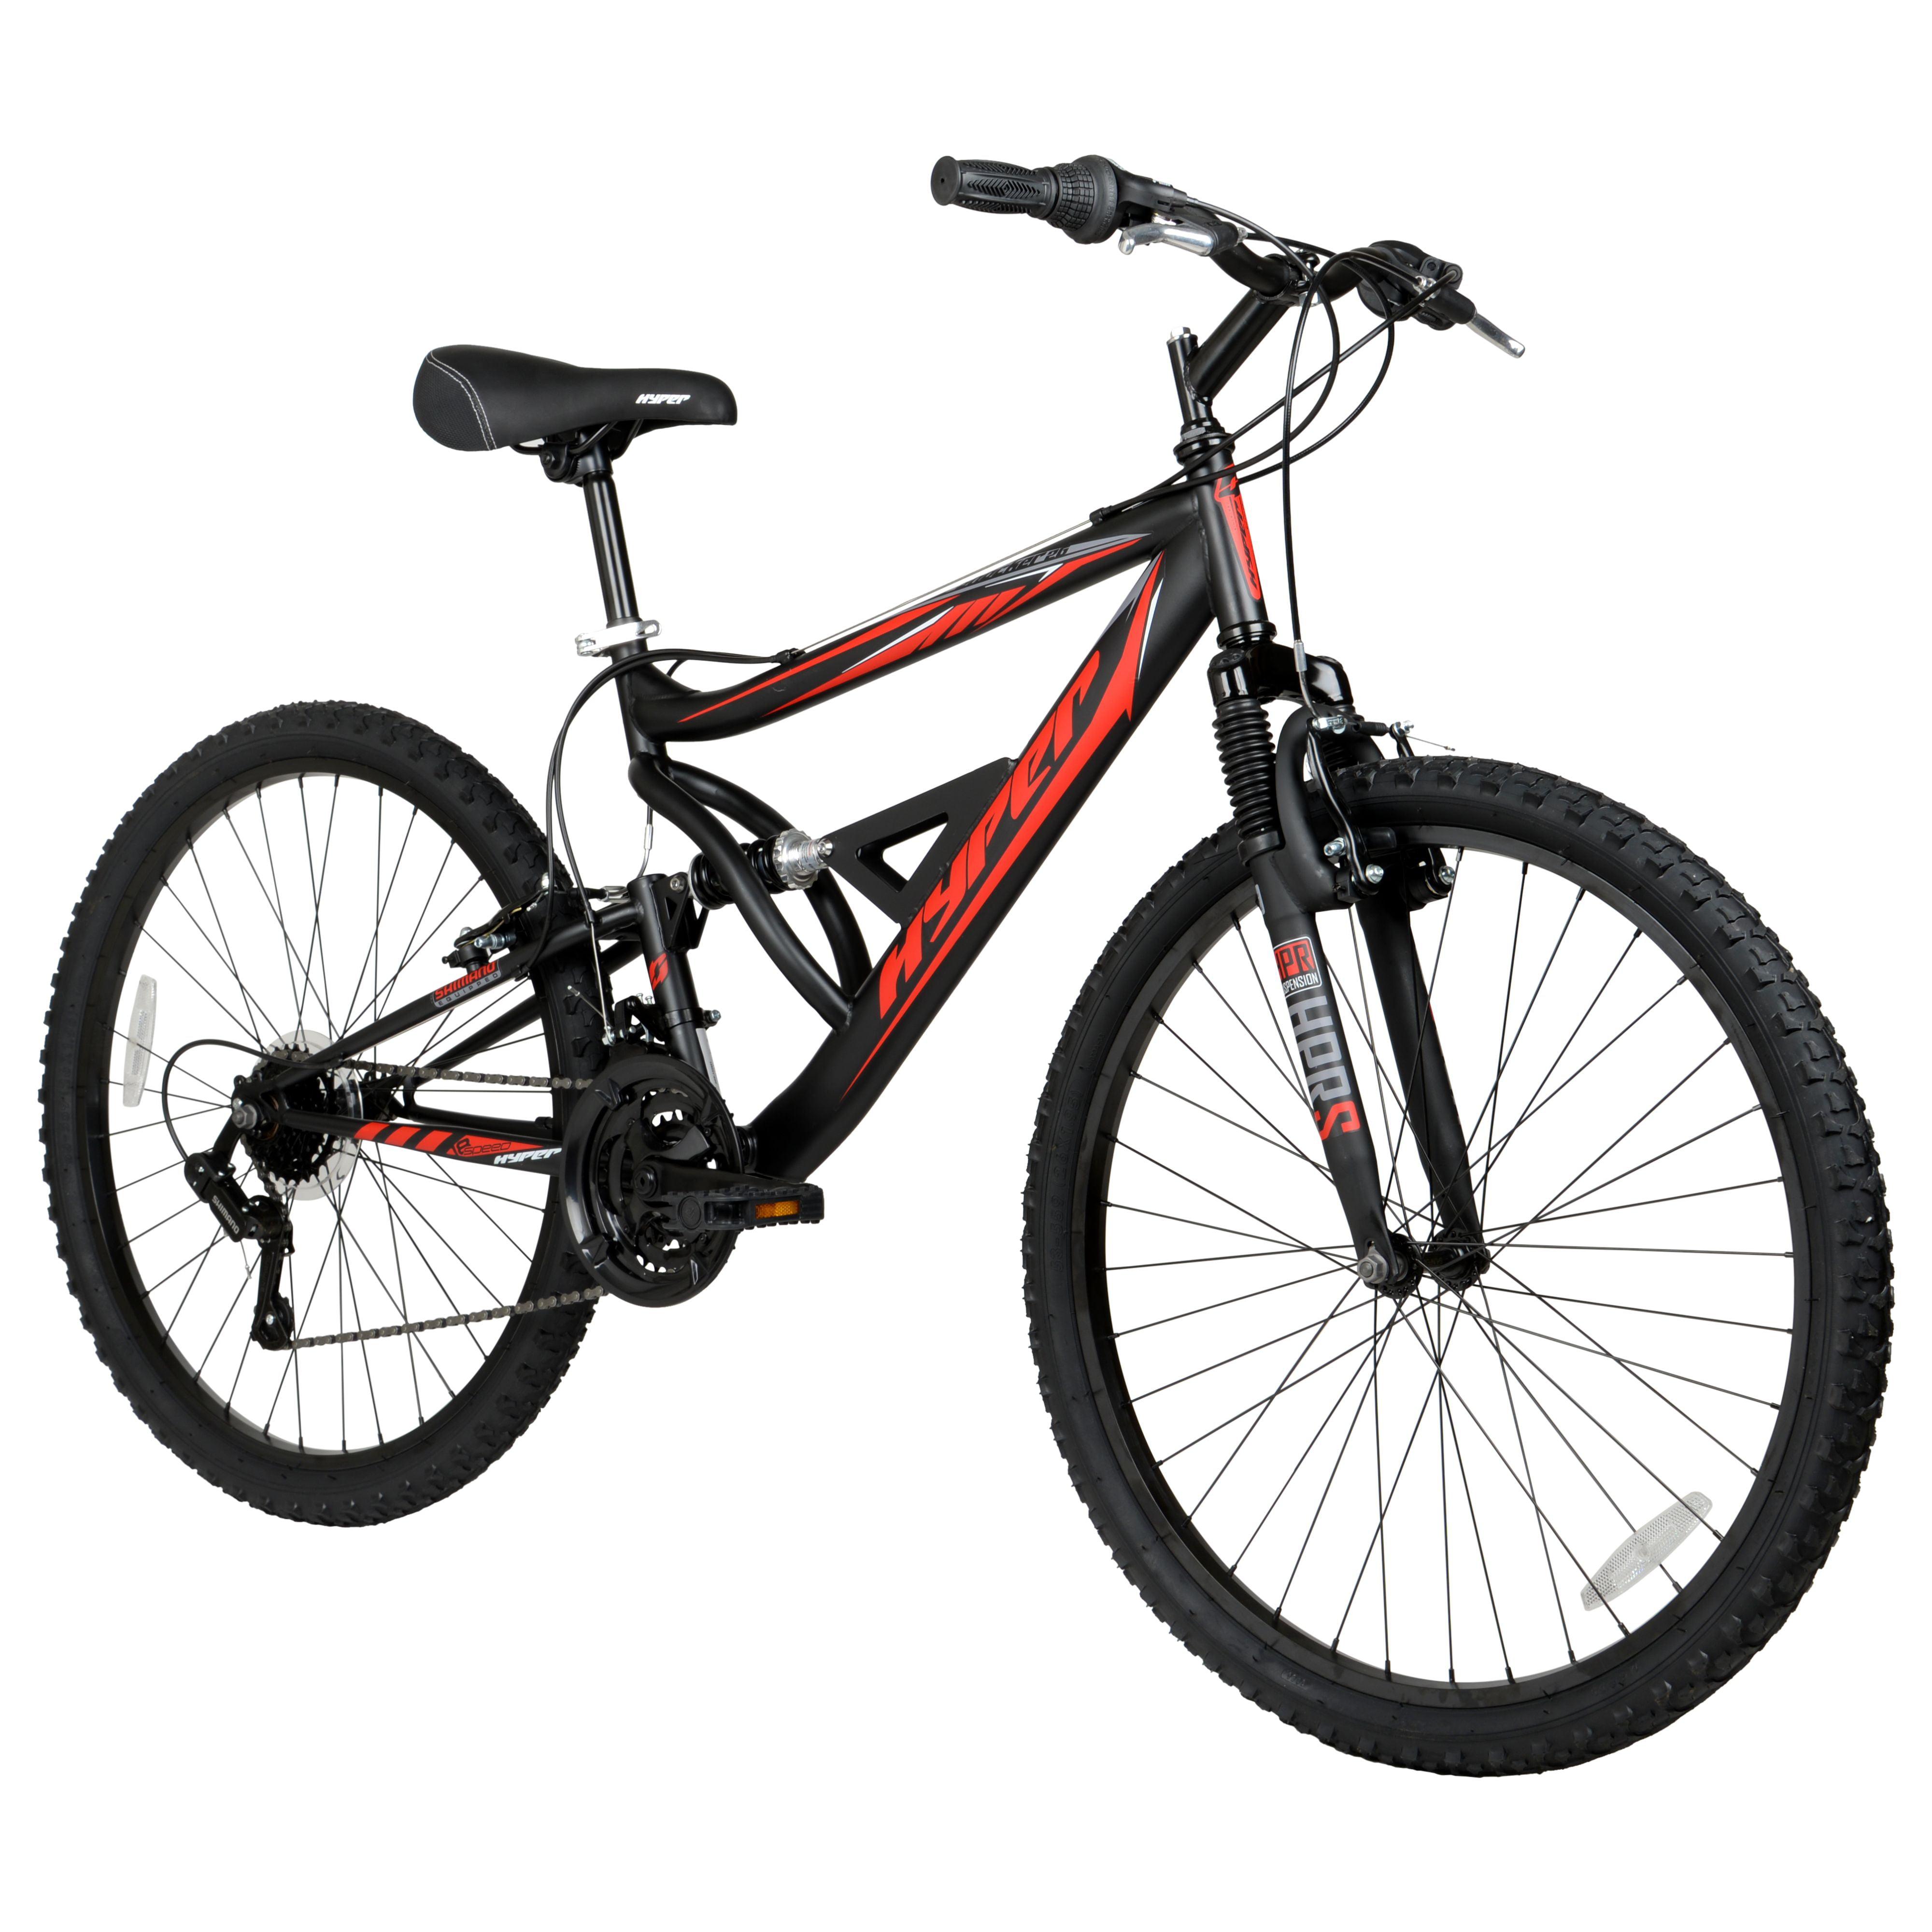 Dual Suspension Mountain Bike >> Hyper 26 Shocker Men S Dual Suspension Mountain Bike Black